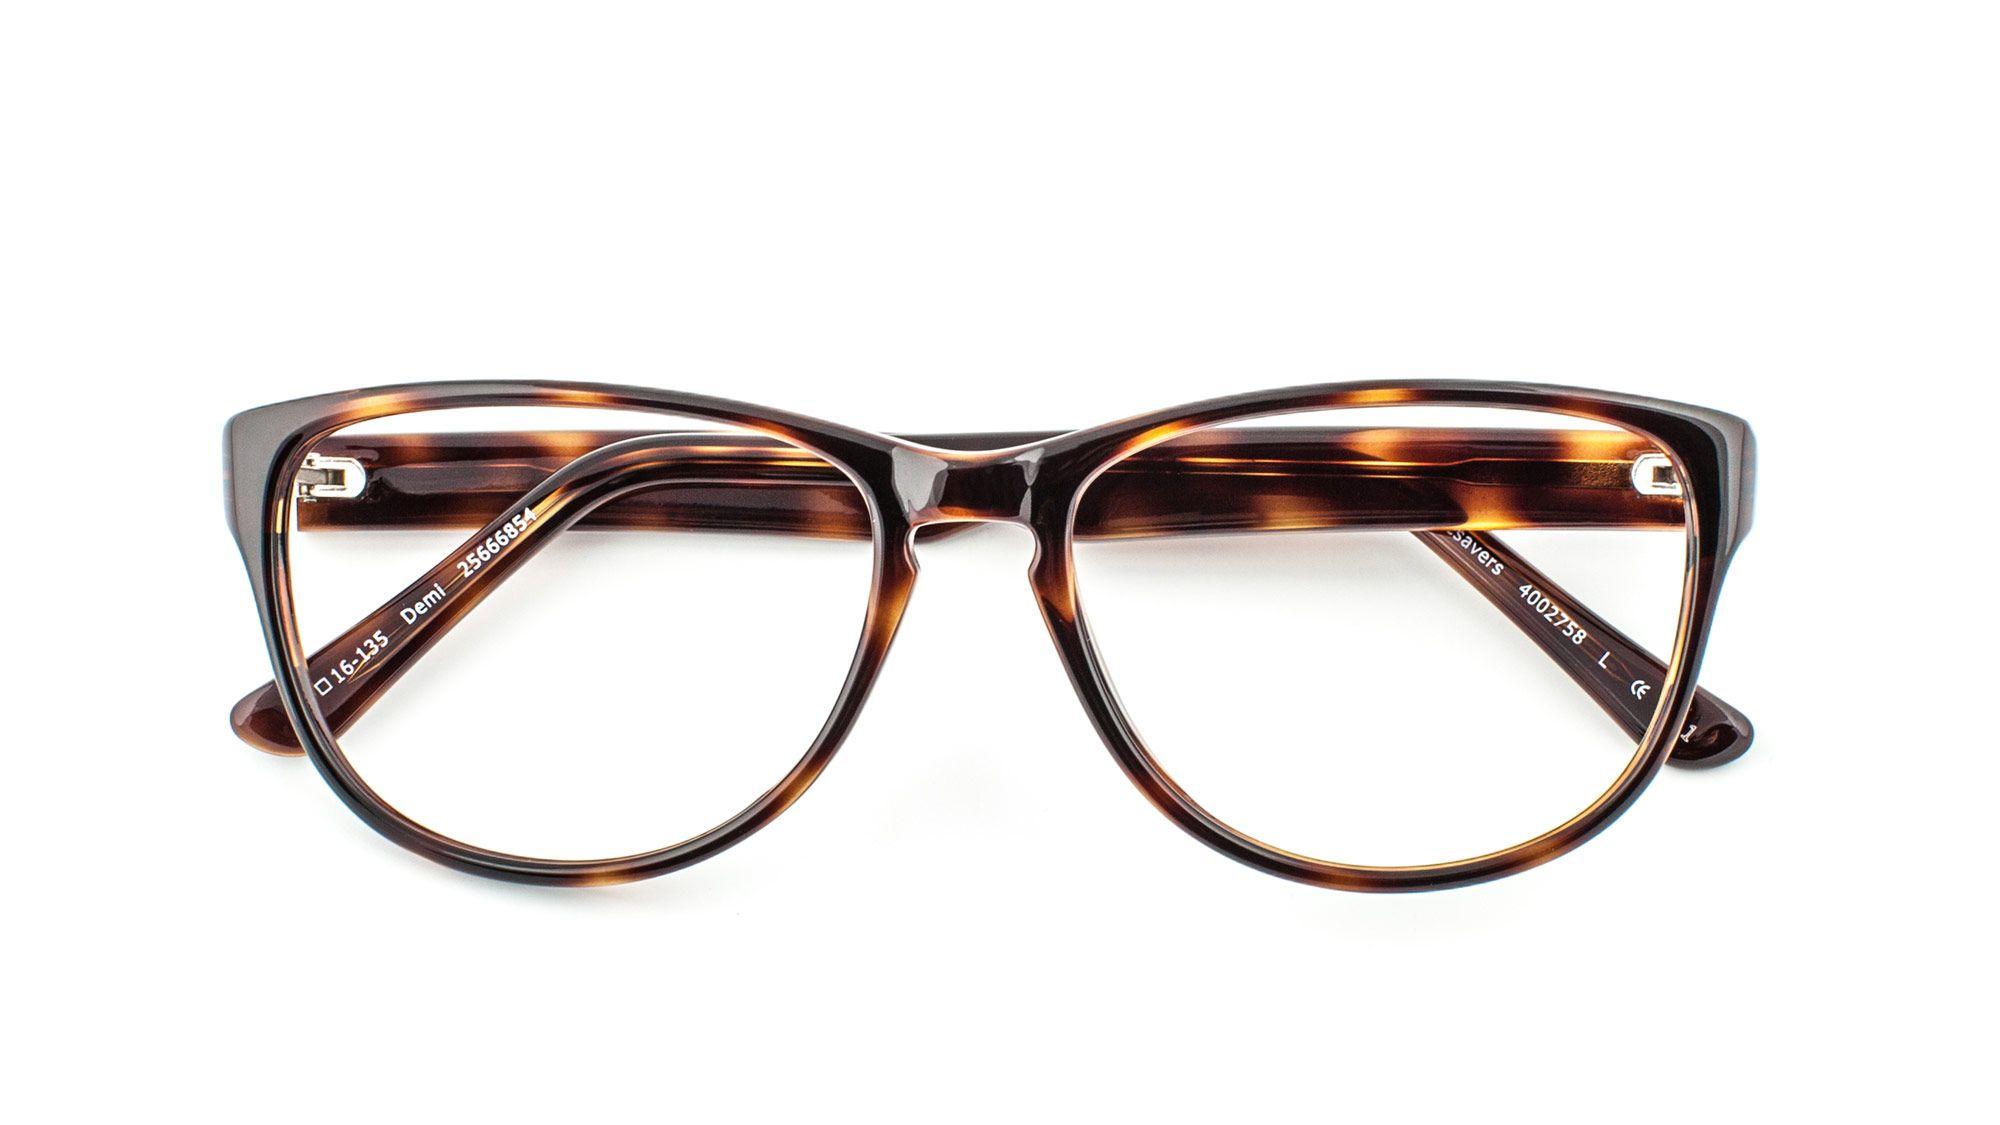 Specsavers Optometrists - Designer Glasses, Sunglasses, Contact ...